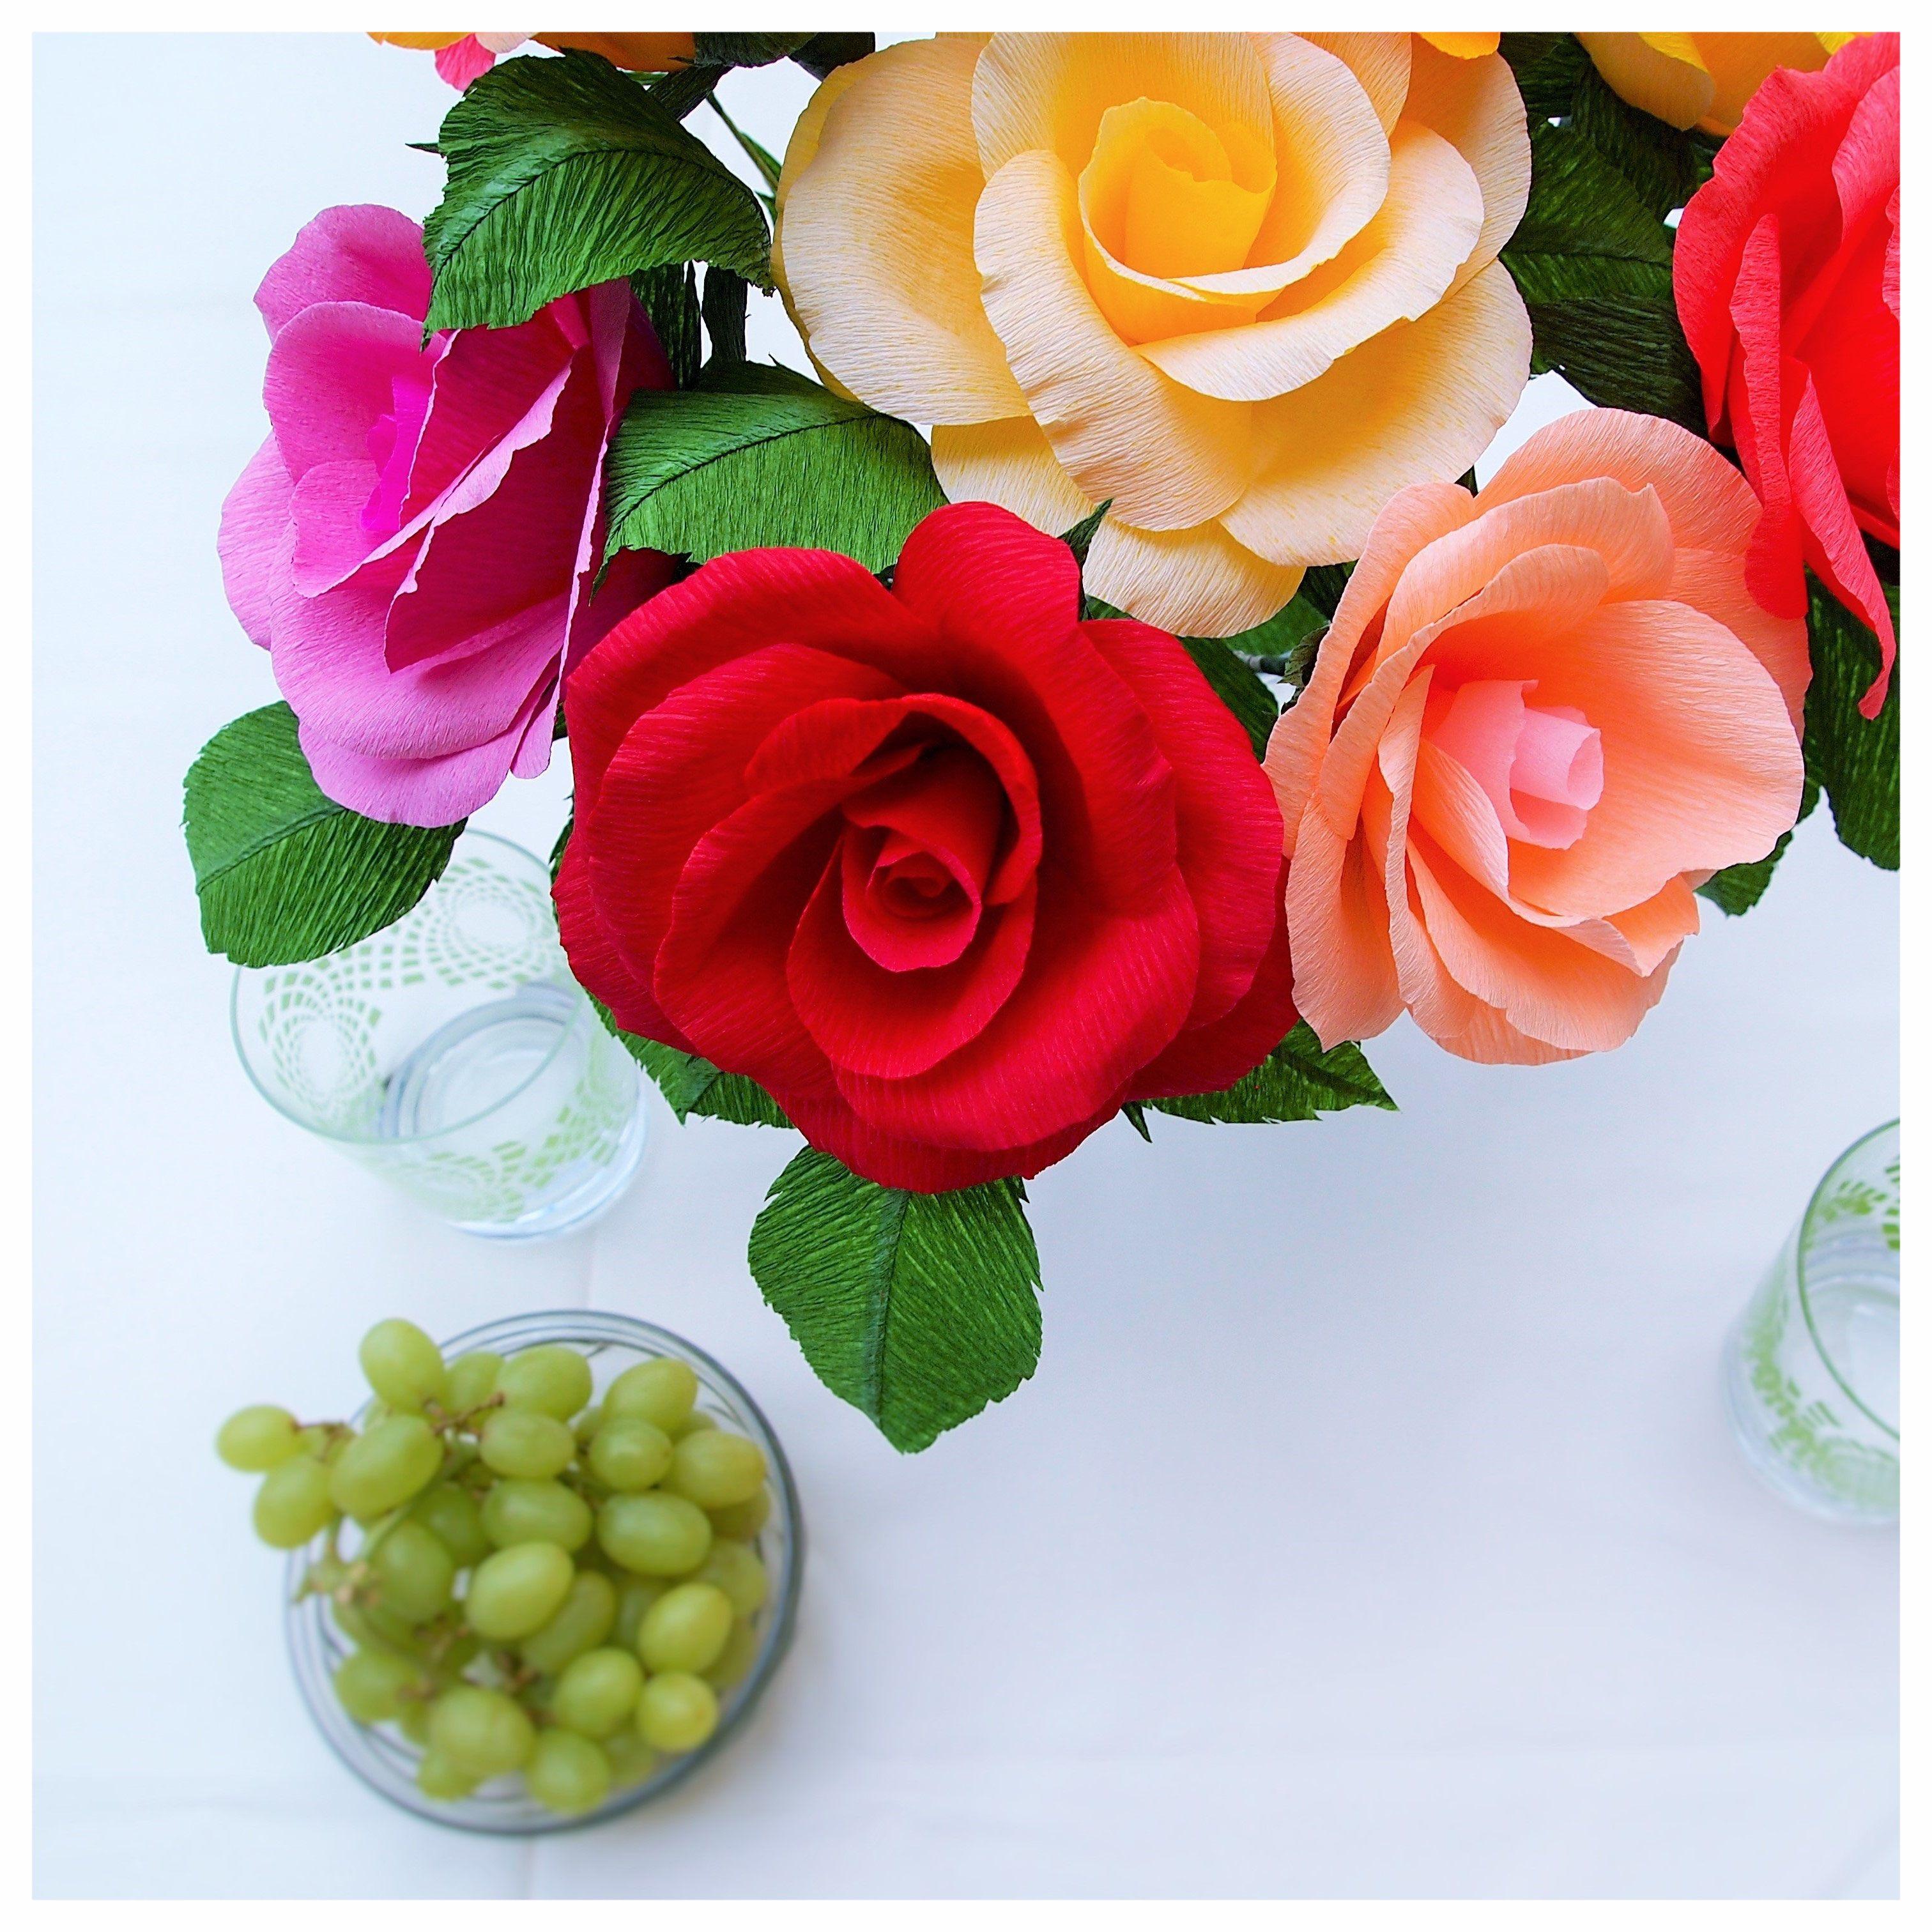 The freshness of the autumn handmade crepe paper roses by amelis handmade crepe paper roses by amelis lovely creations mightylinksfo